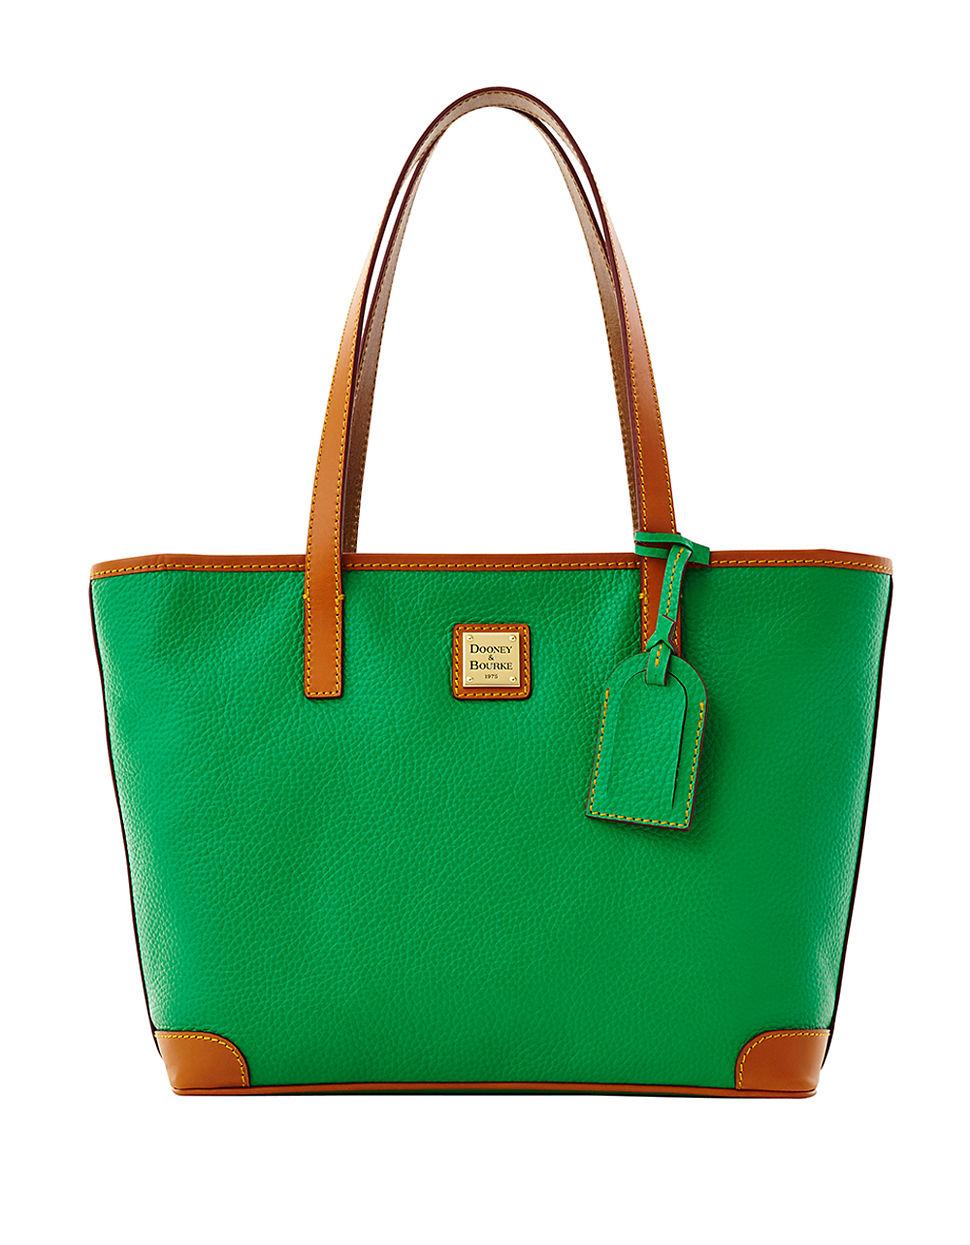 https://cdnd.lystit.com/photos/e10b-2014/02/12/dooney-bourke-green-charleston-shopper-leather-tote-bag-product-1-17474092-0-050089415-normal.jpeg